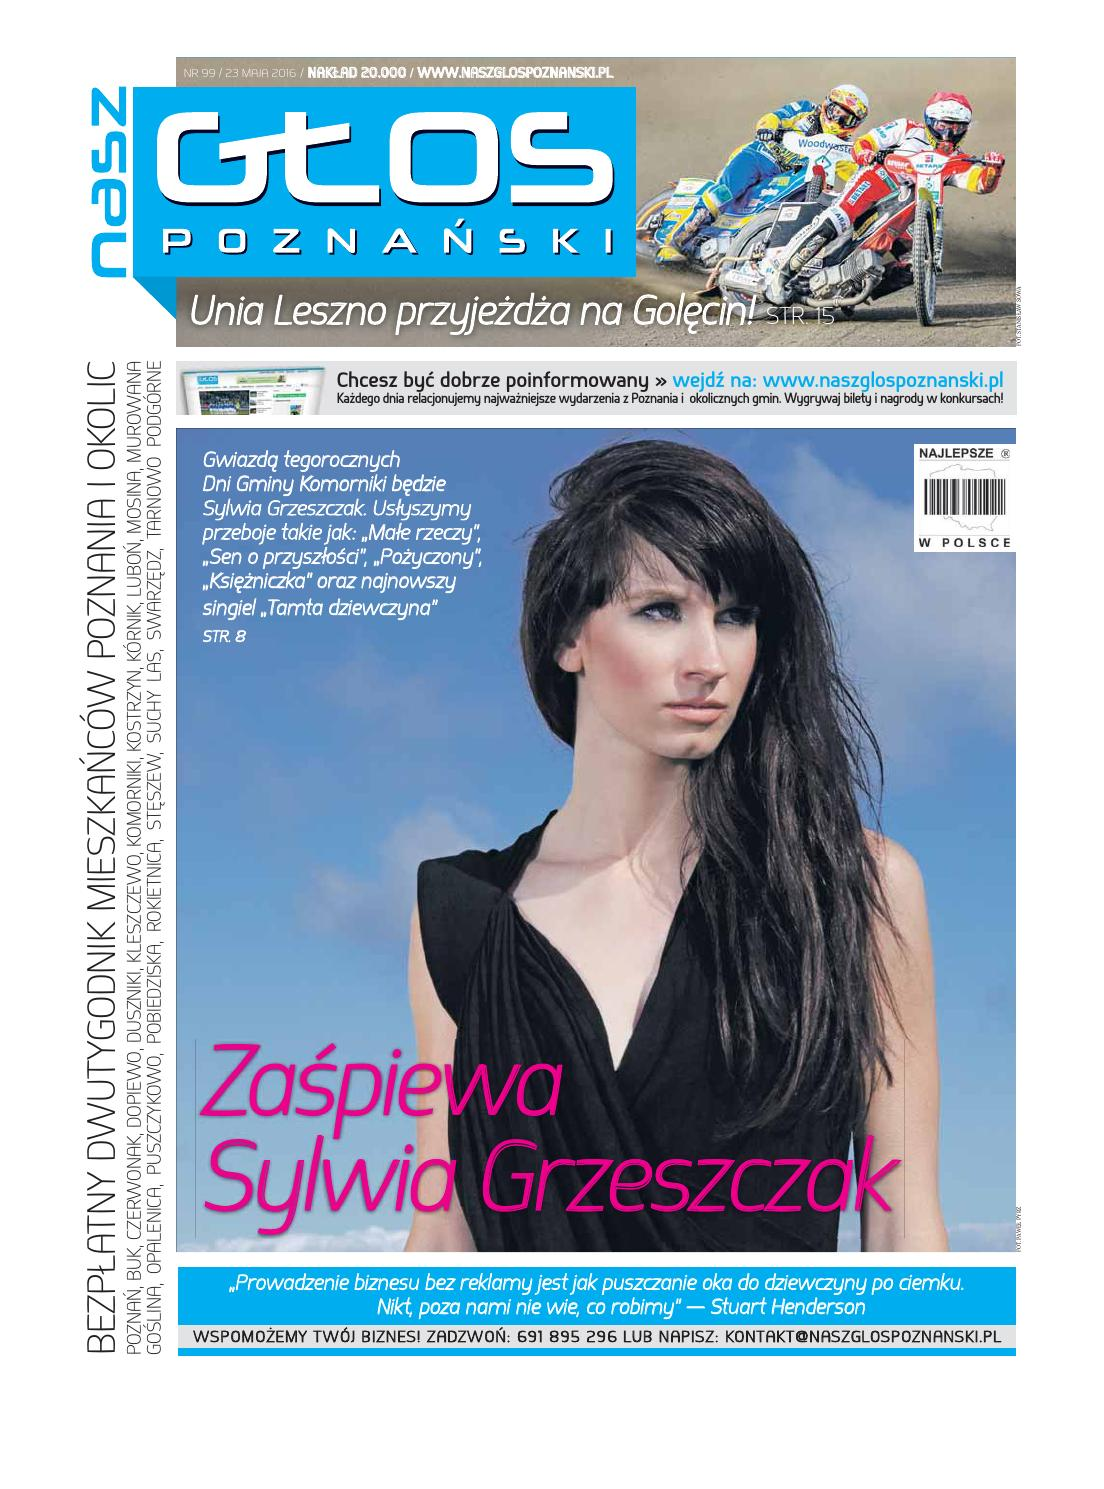 Pan szuka pani Pozna - Ogoszenia Pozna - sixpackwallpapers.com